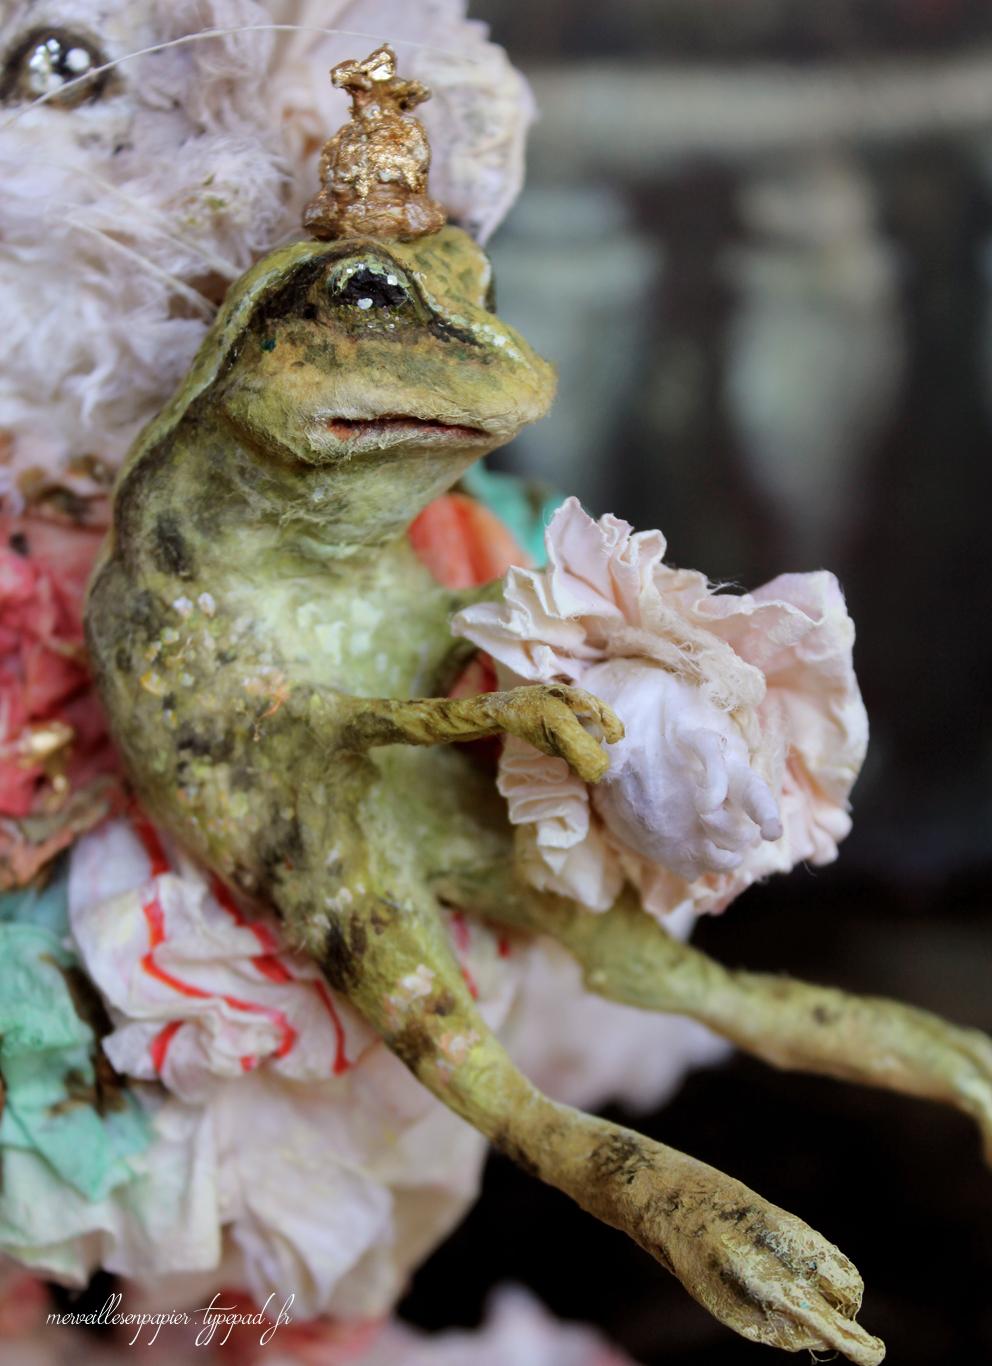 princesse-chat-et-sa-grenouille-5.jpg